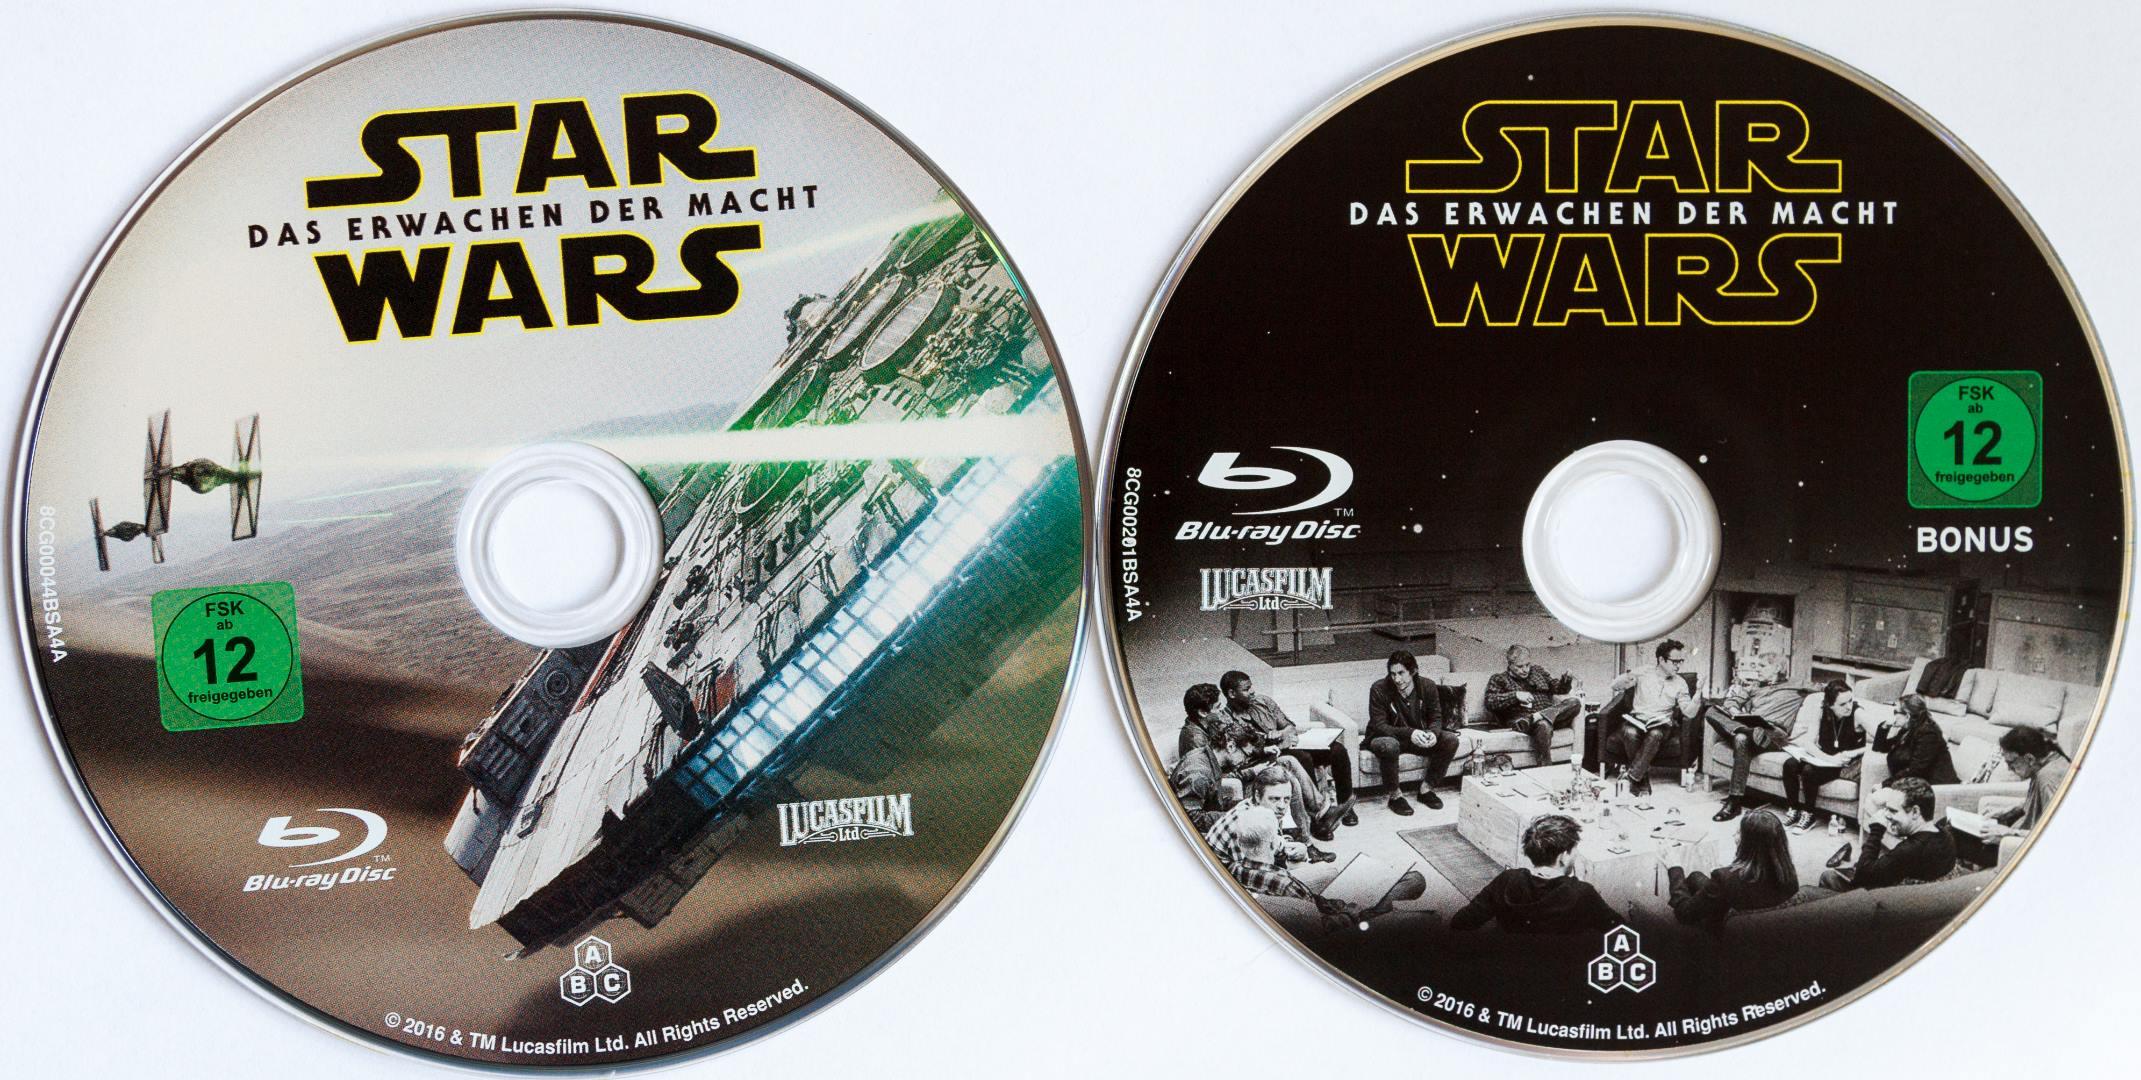 Star Wars 7 Steelbook Disks